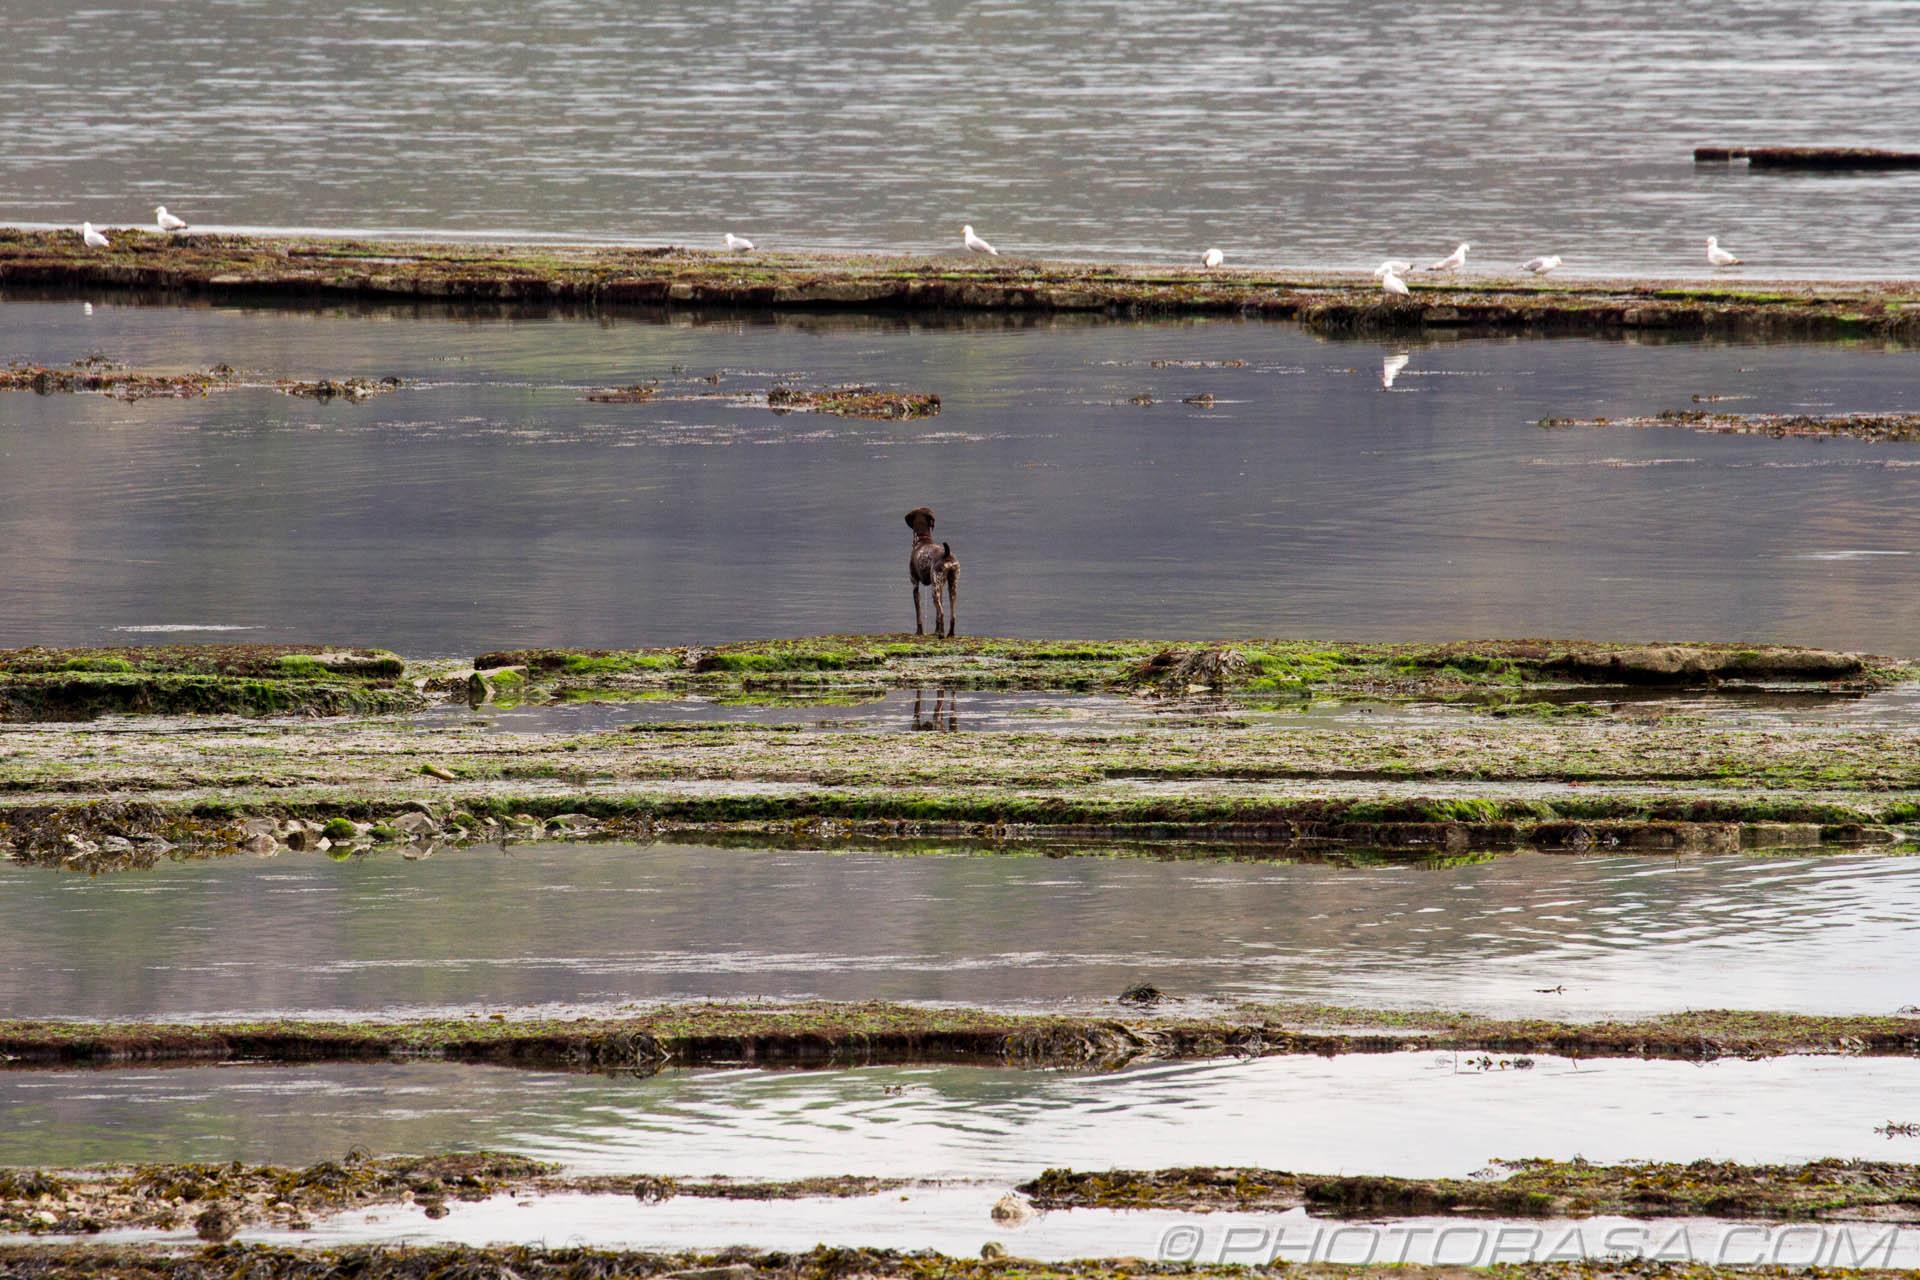 https://photorasa.com/walking-dog-jurassic-coast/looking-across-the-water-at-his-prey/